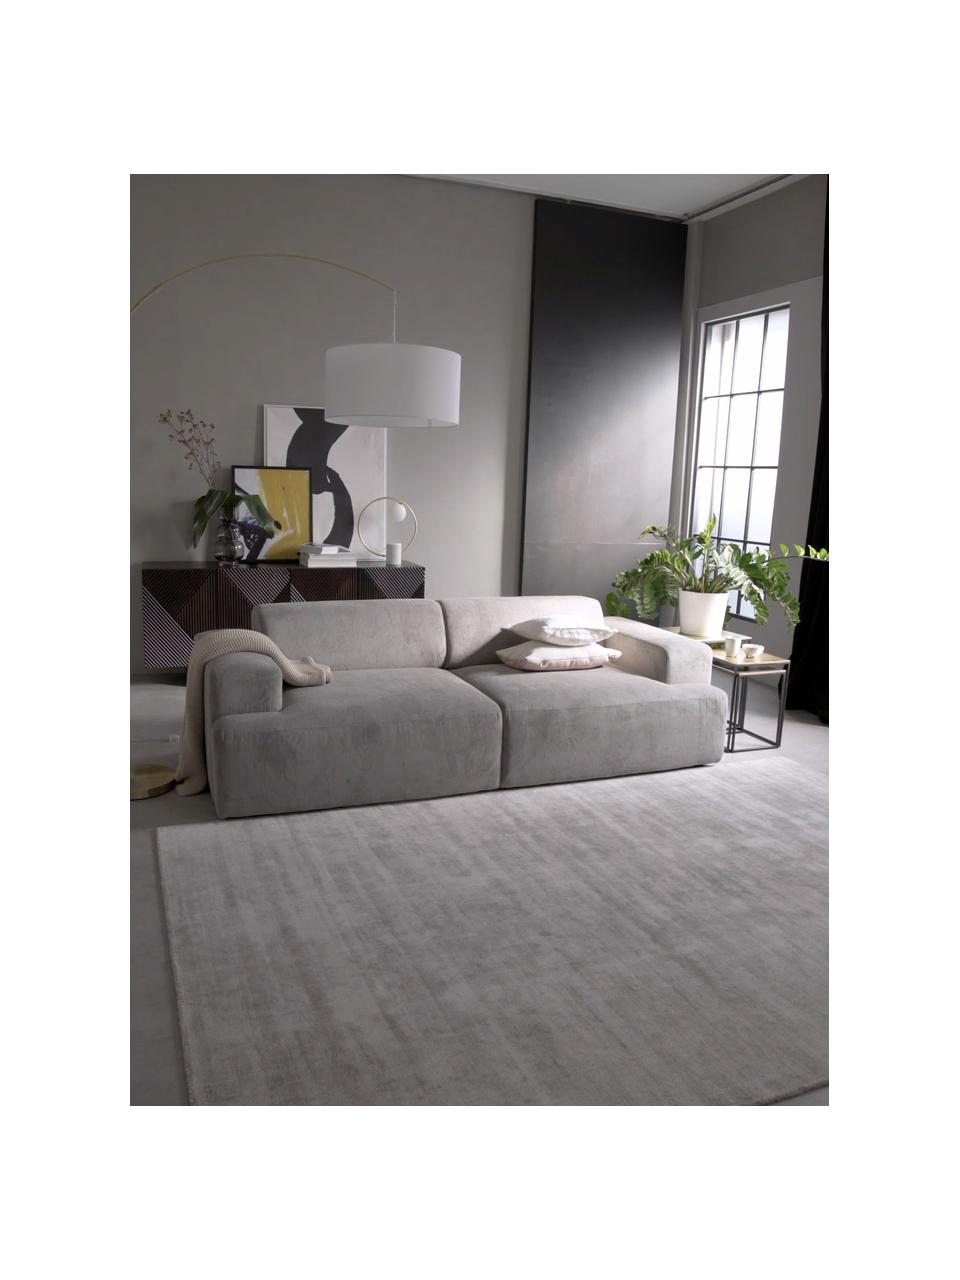 Corduroy bank Melva (3-zits) in grijs, Bekleding: Koord (92% polyester, 8% , Frame: massief grenenhout, spaan, Poten: grenenhout De poten bevin, Grijs, B 240 x D 101 cm